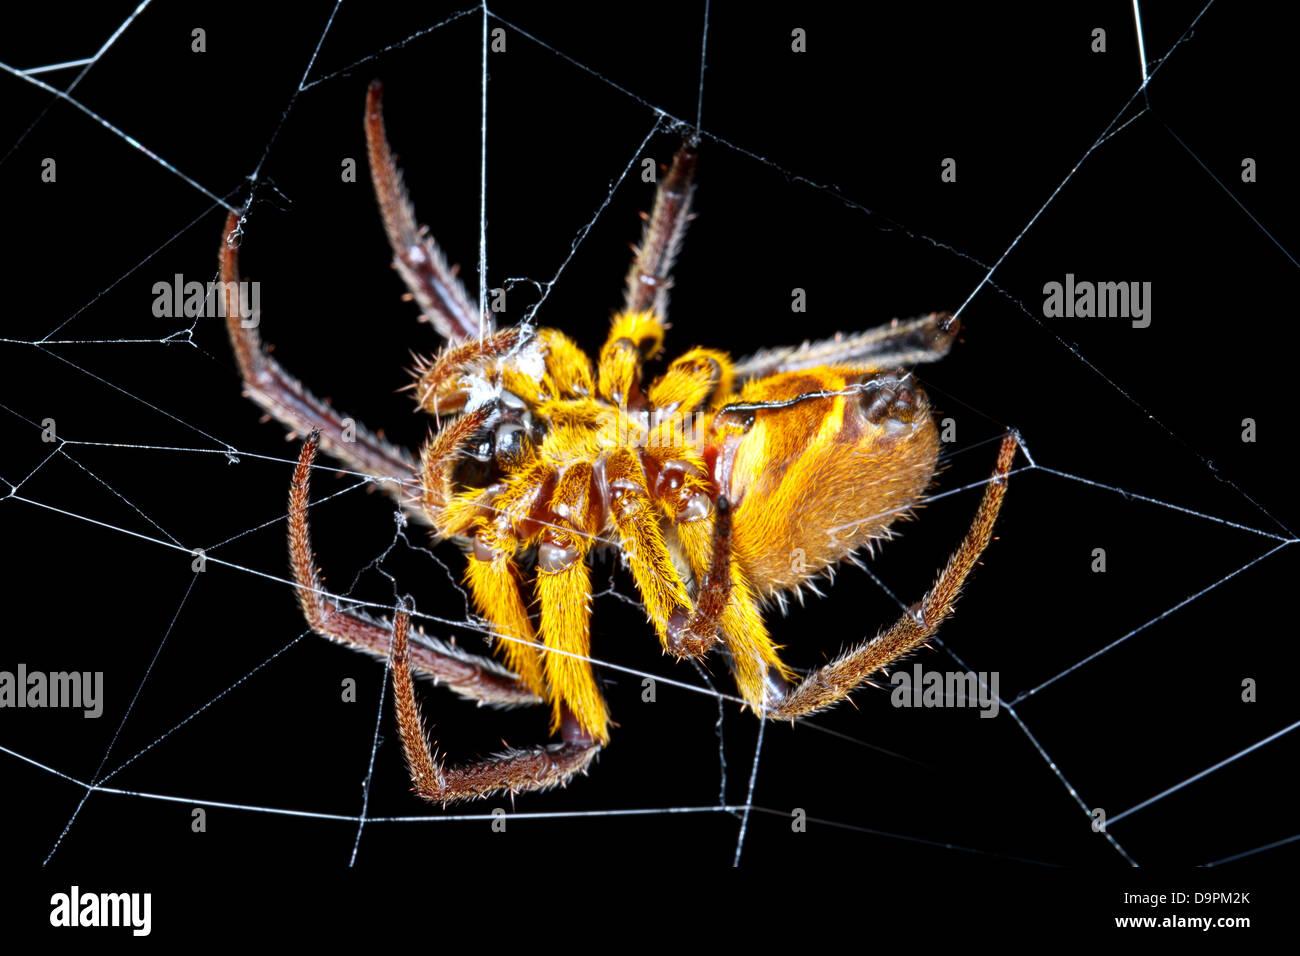 Amazonian orb-web spider at night, Ecuador - Stock Image